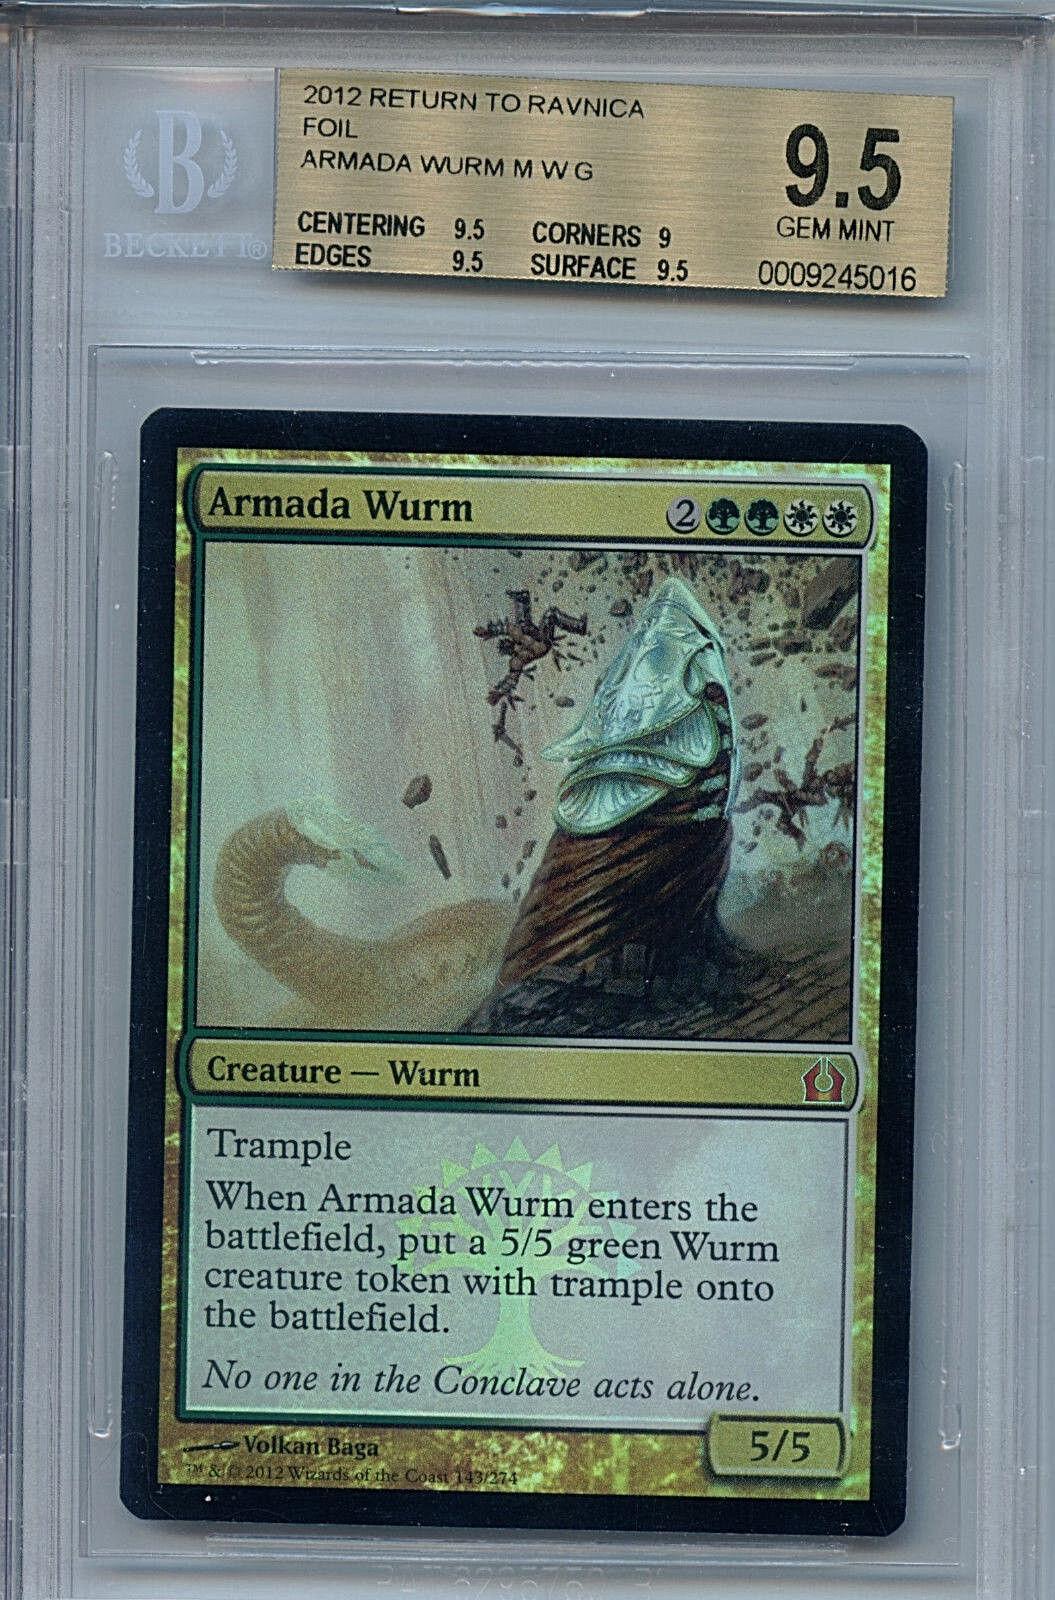 MTG Armada Armada Armada Wurm BGS 9.5 GM Return to Ravnica Mystic Foil Magic Card Amricons d48ff3